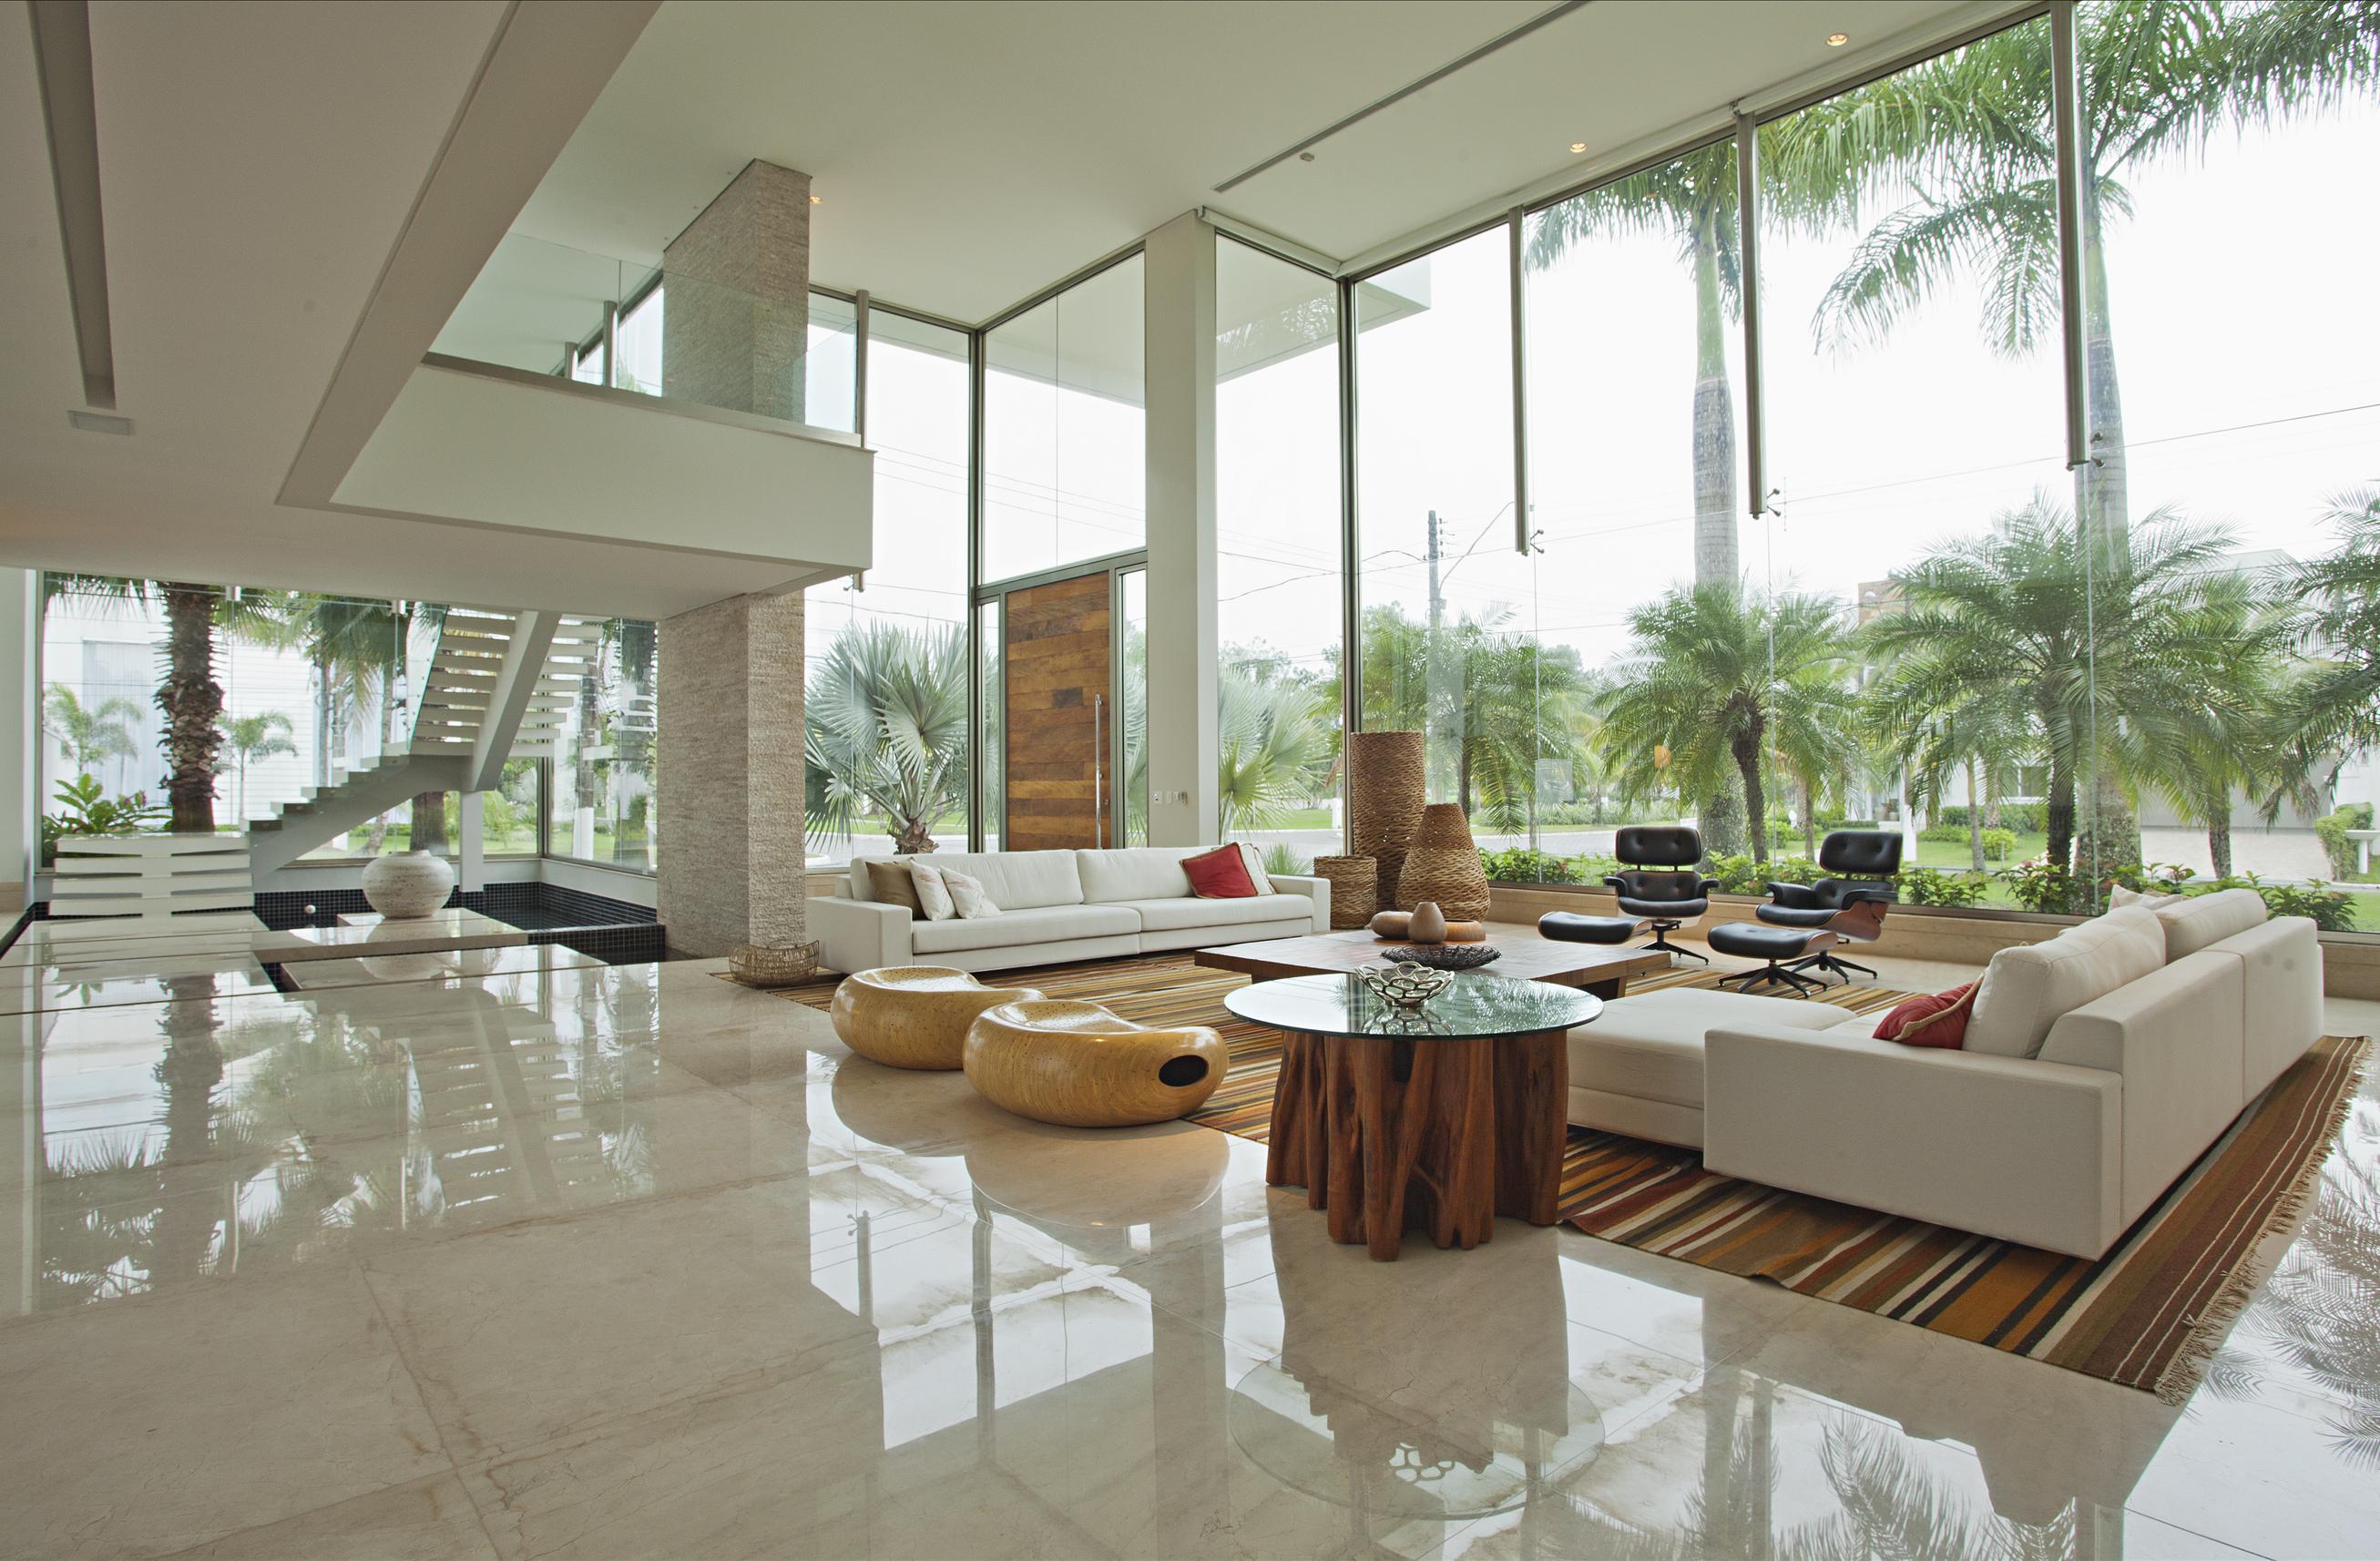 Einfamilienhaus für Verkauf beim Luxury Beach House Rua Noventra e três Guaruja, Sao Paulo, 11445785 Brasilien